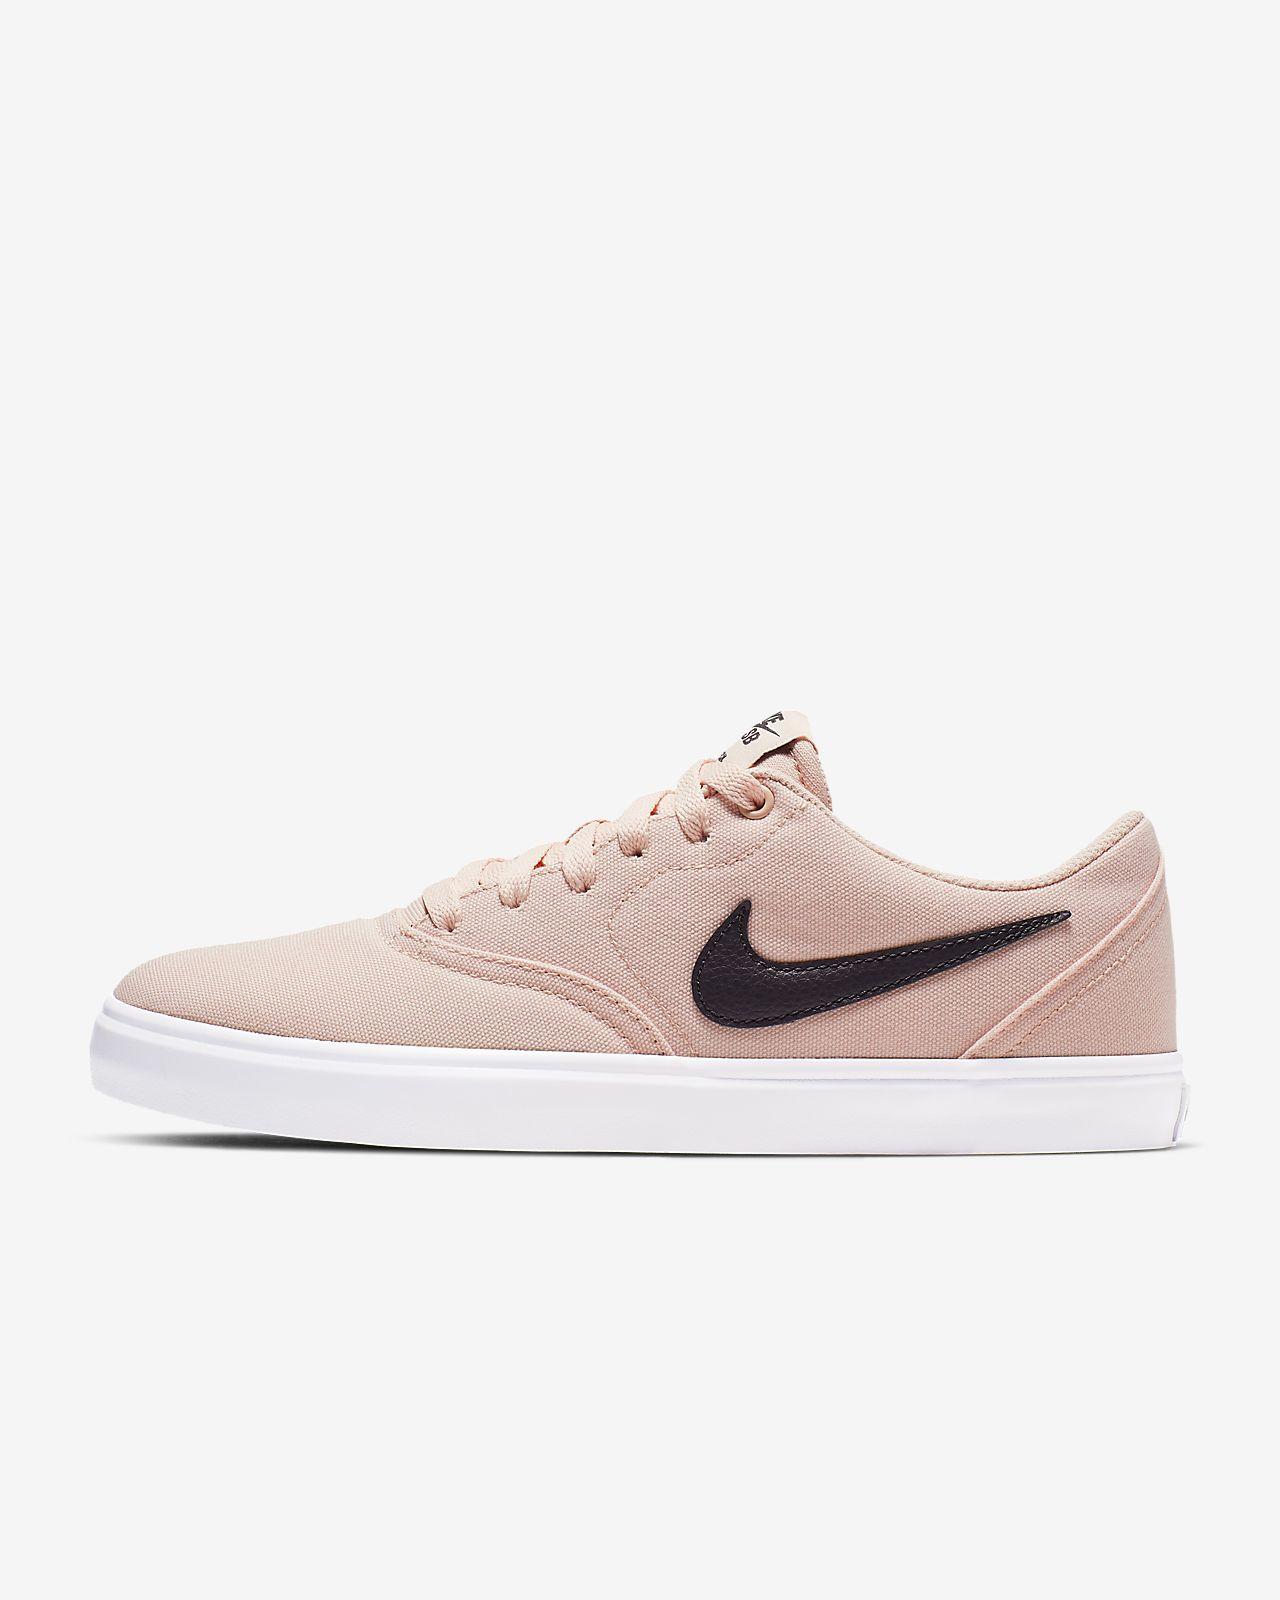 nike sb check solar beige Shop Clothing & Shoes Online